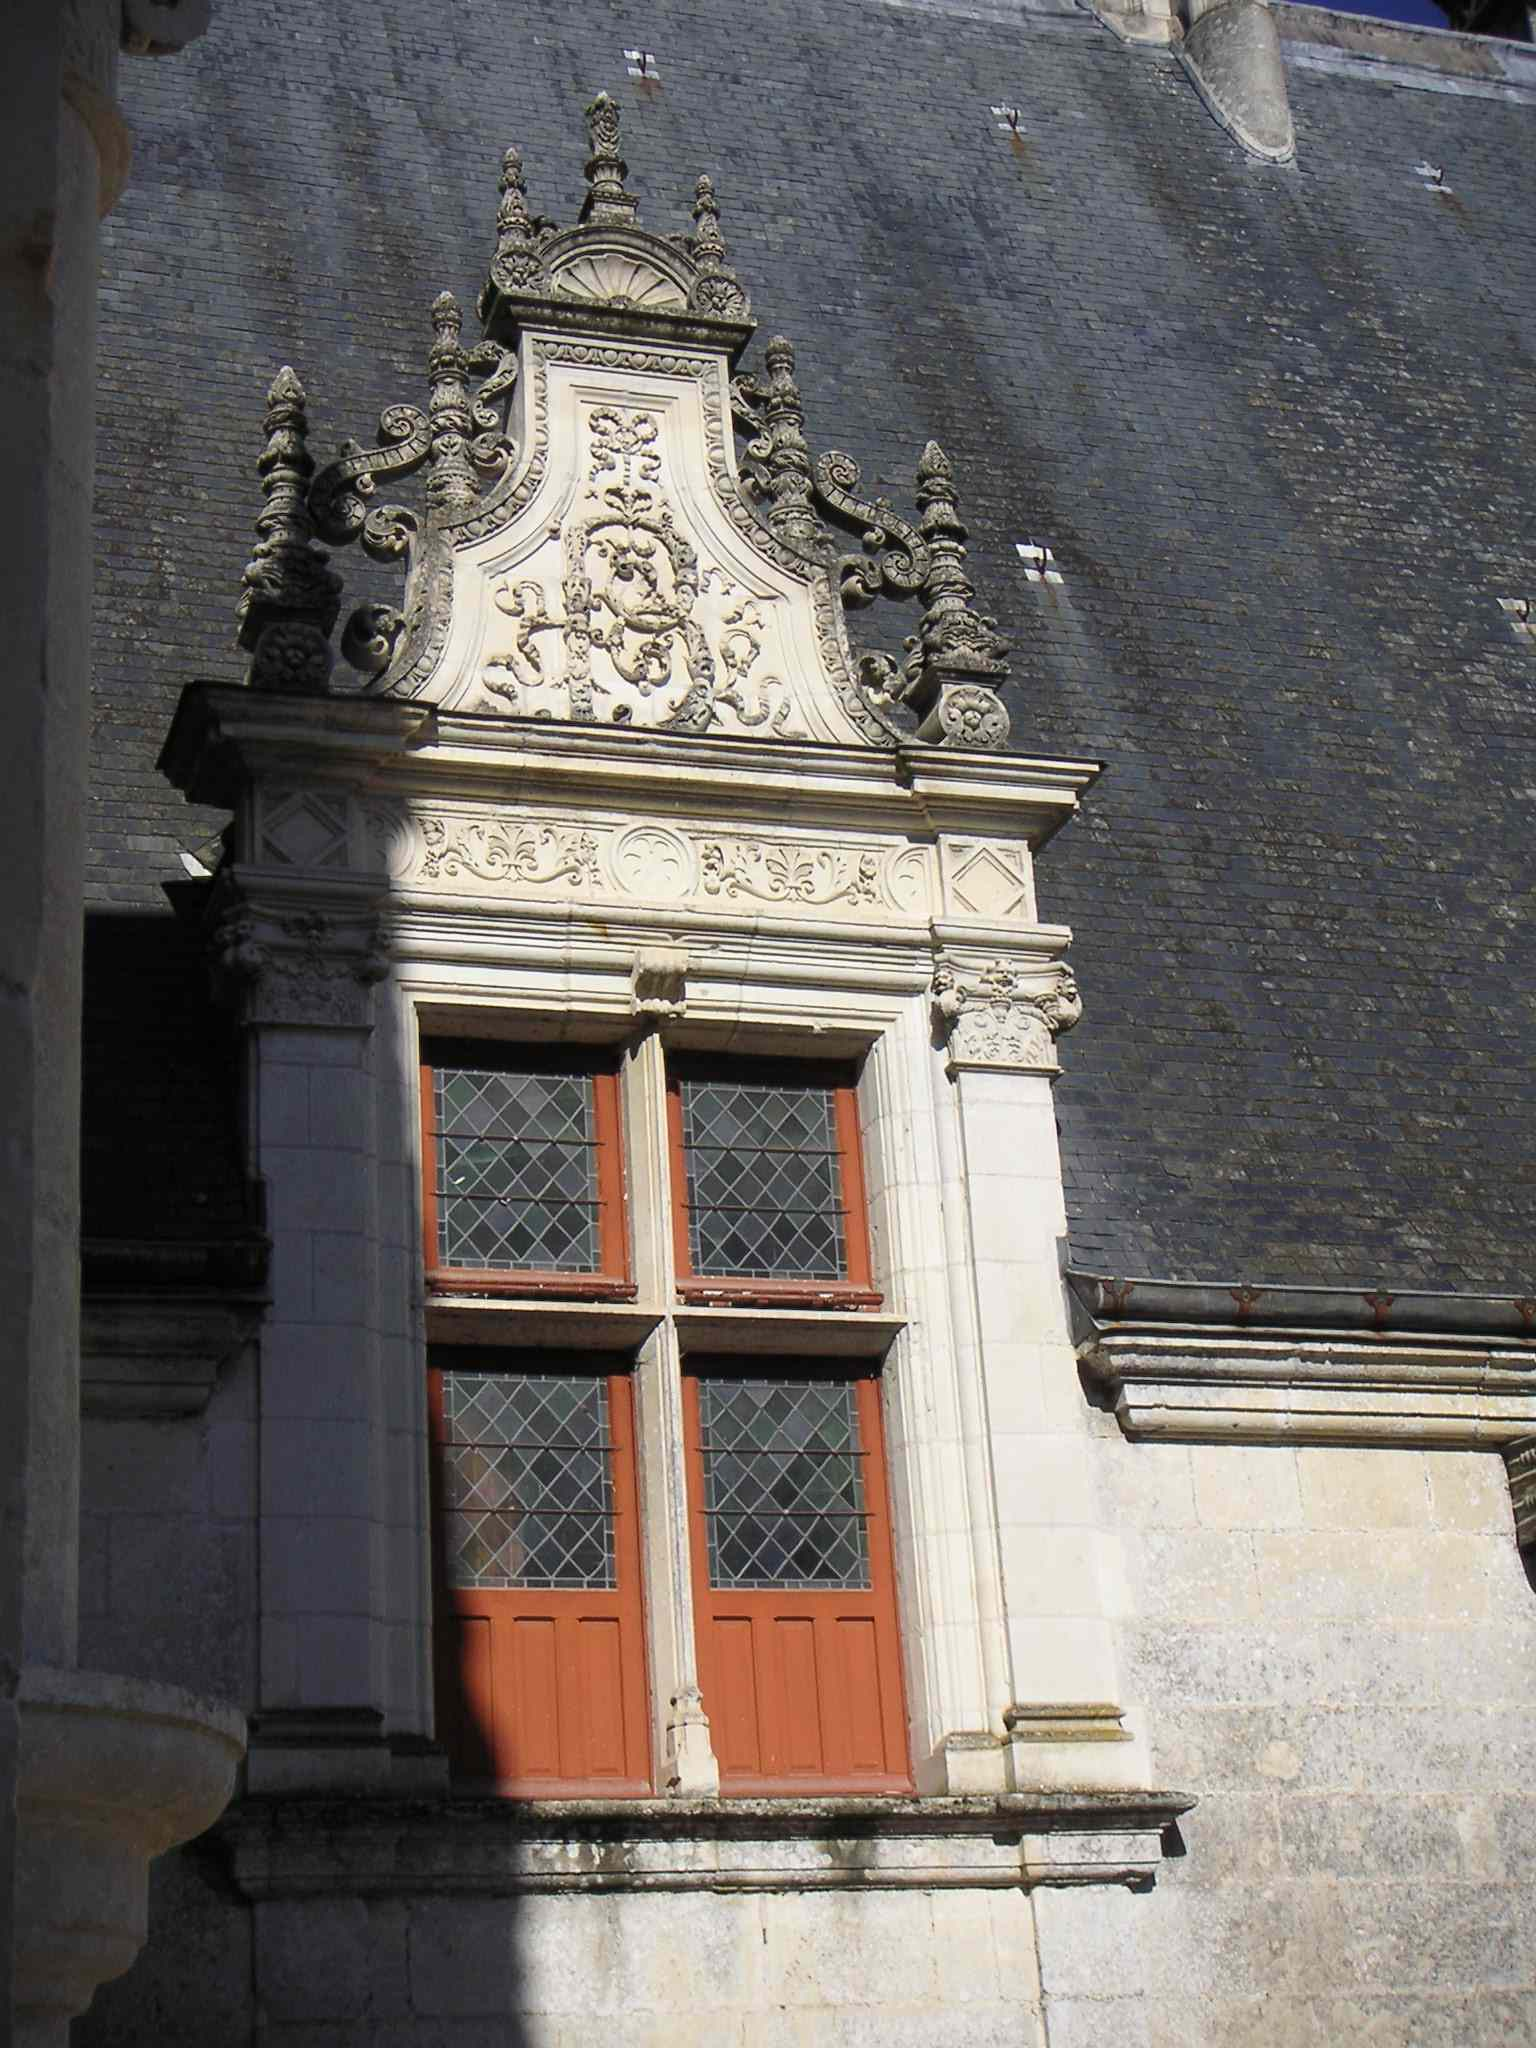 Fichier:Lucarne B Azay-le-rideau.JPG — Wikipédia